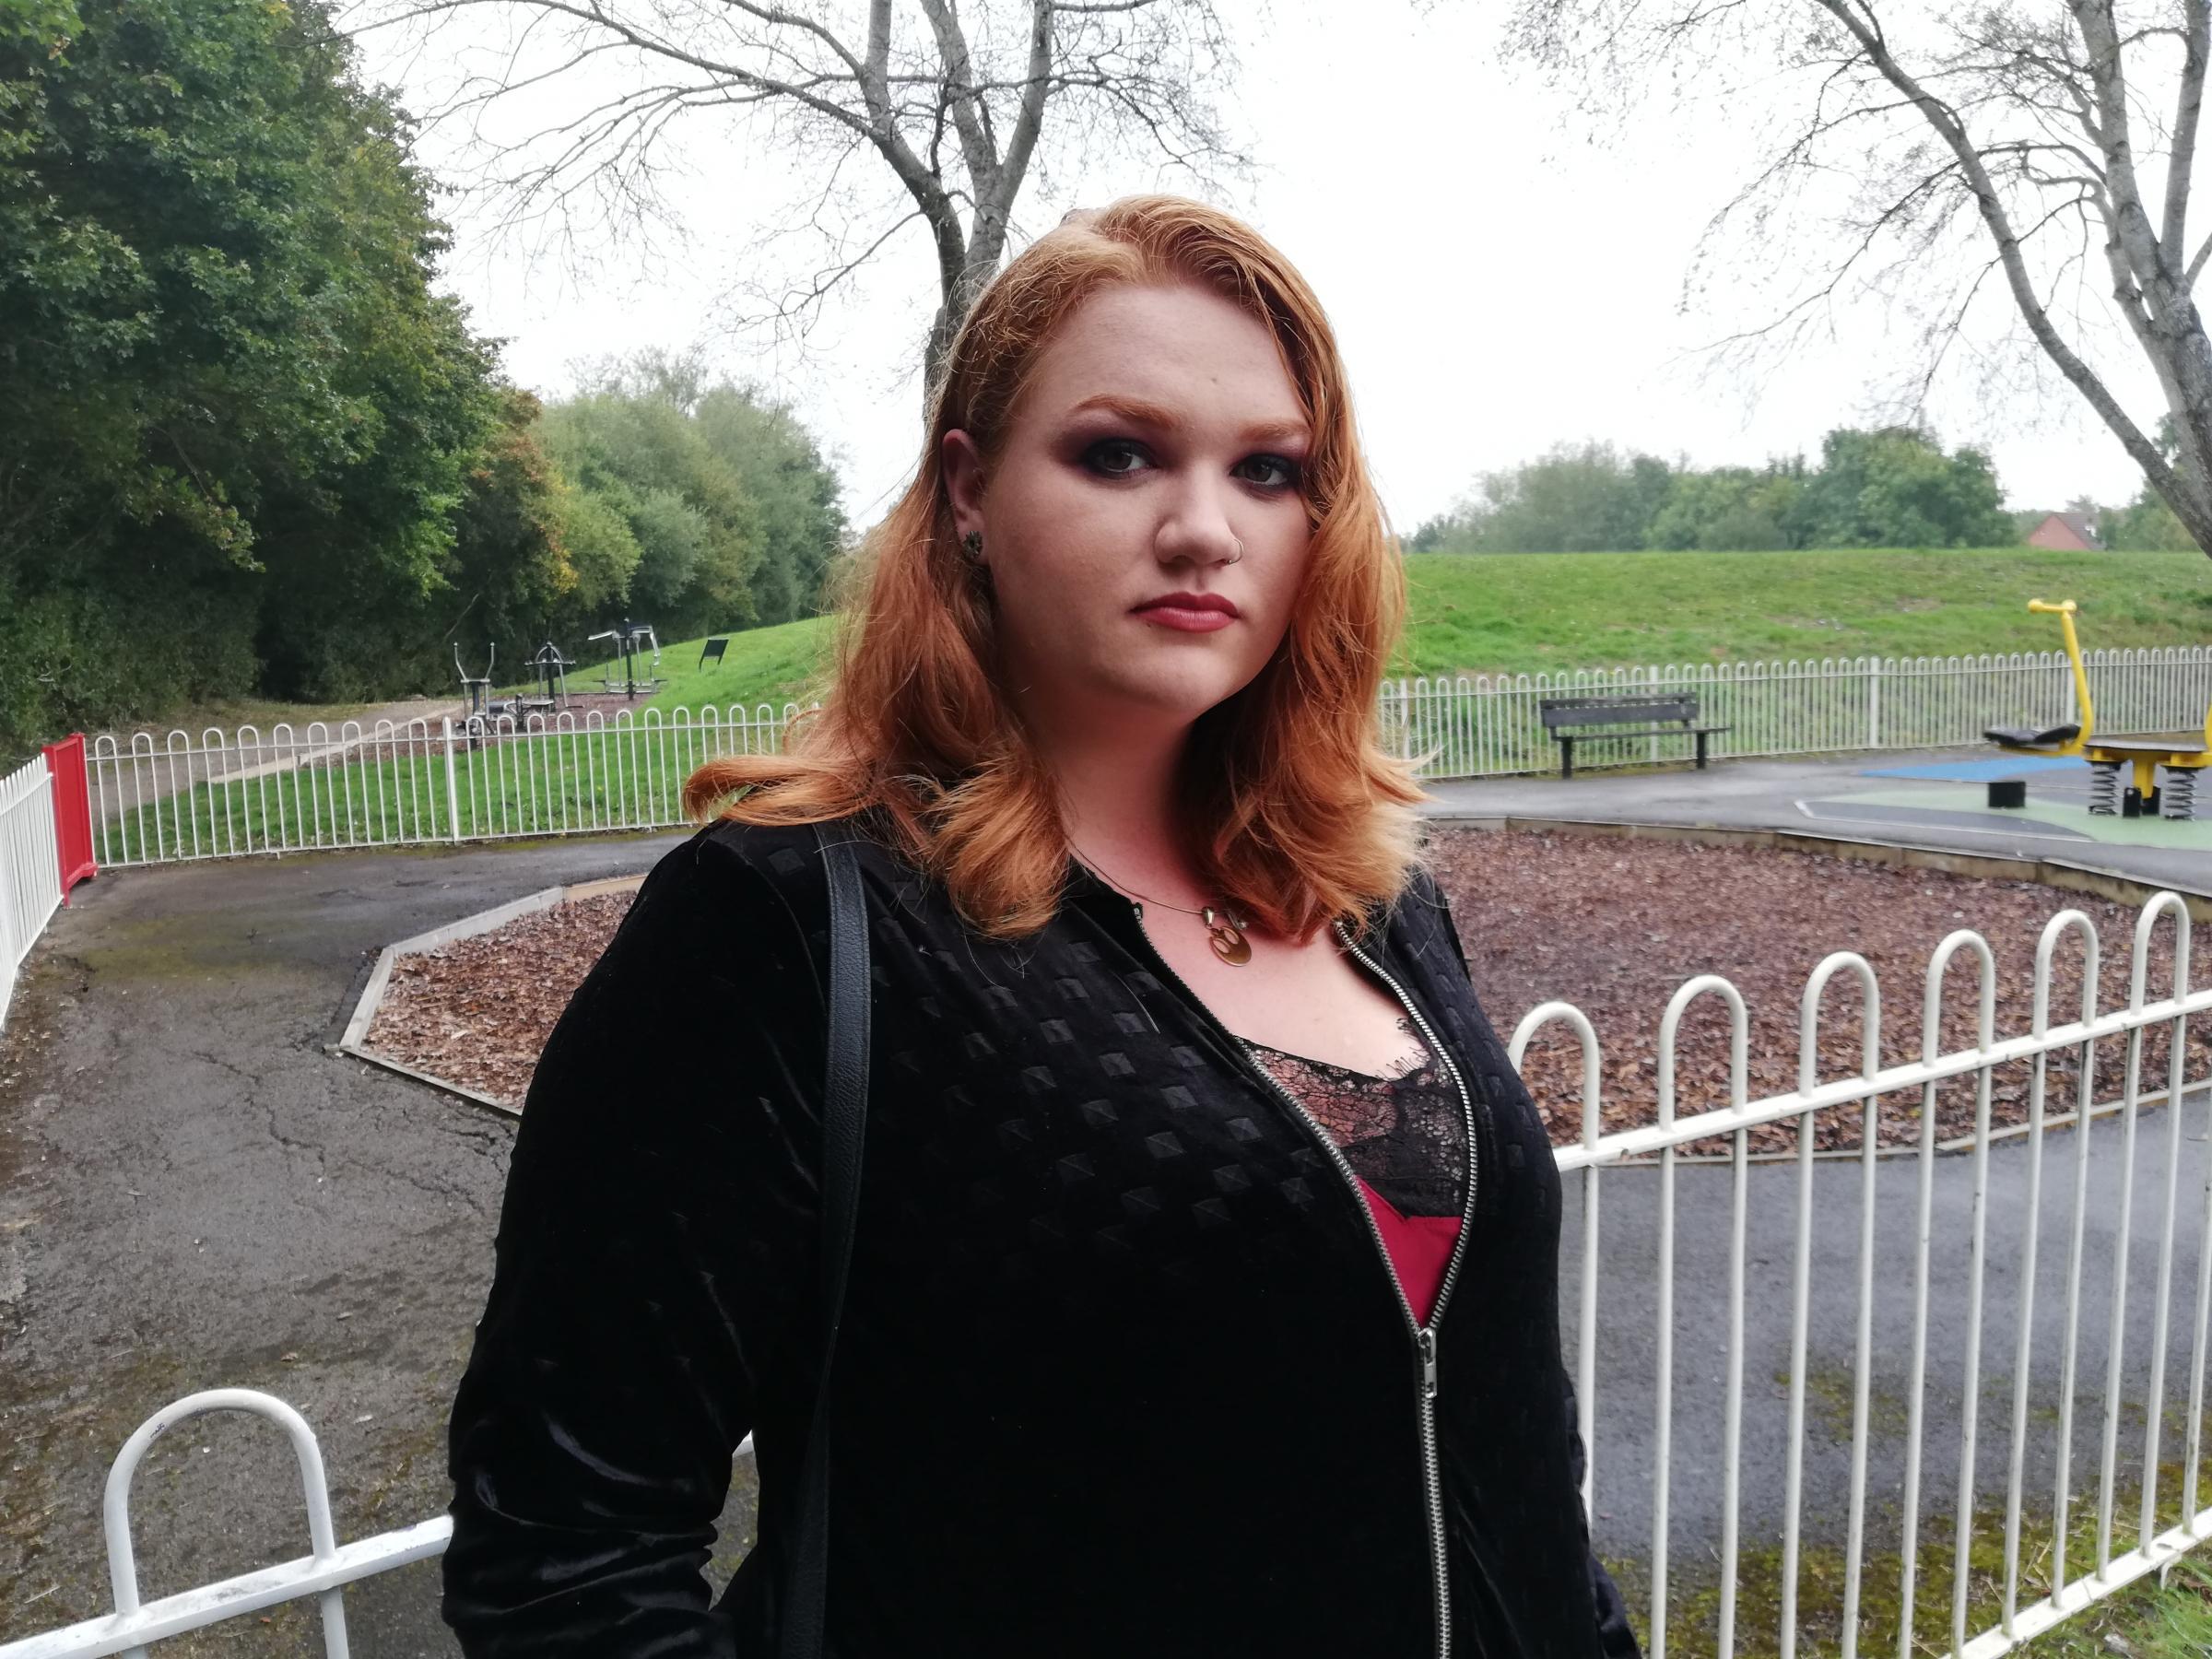 Woman body shamed as boys chant 'porky' in Middleleaze Park